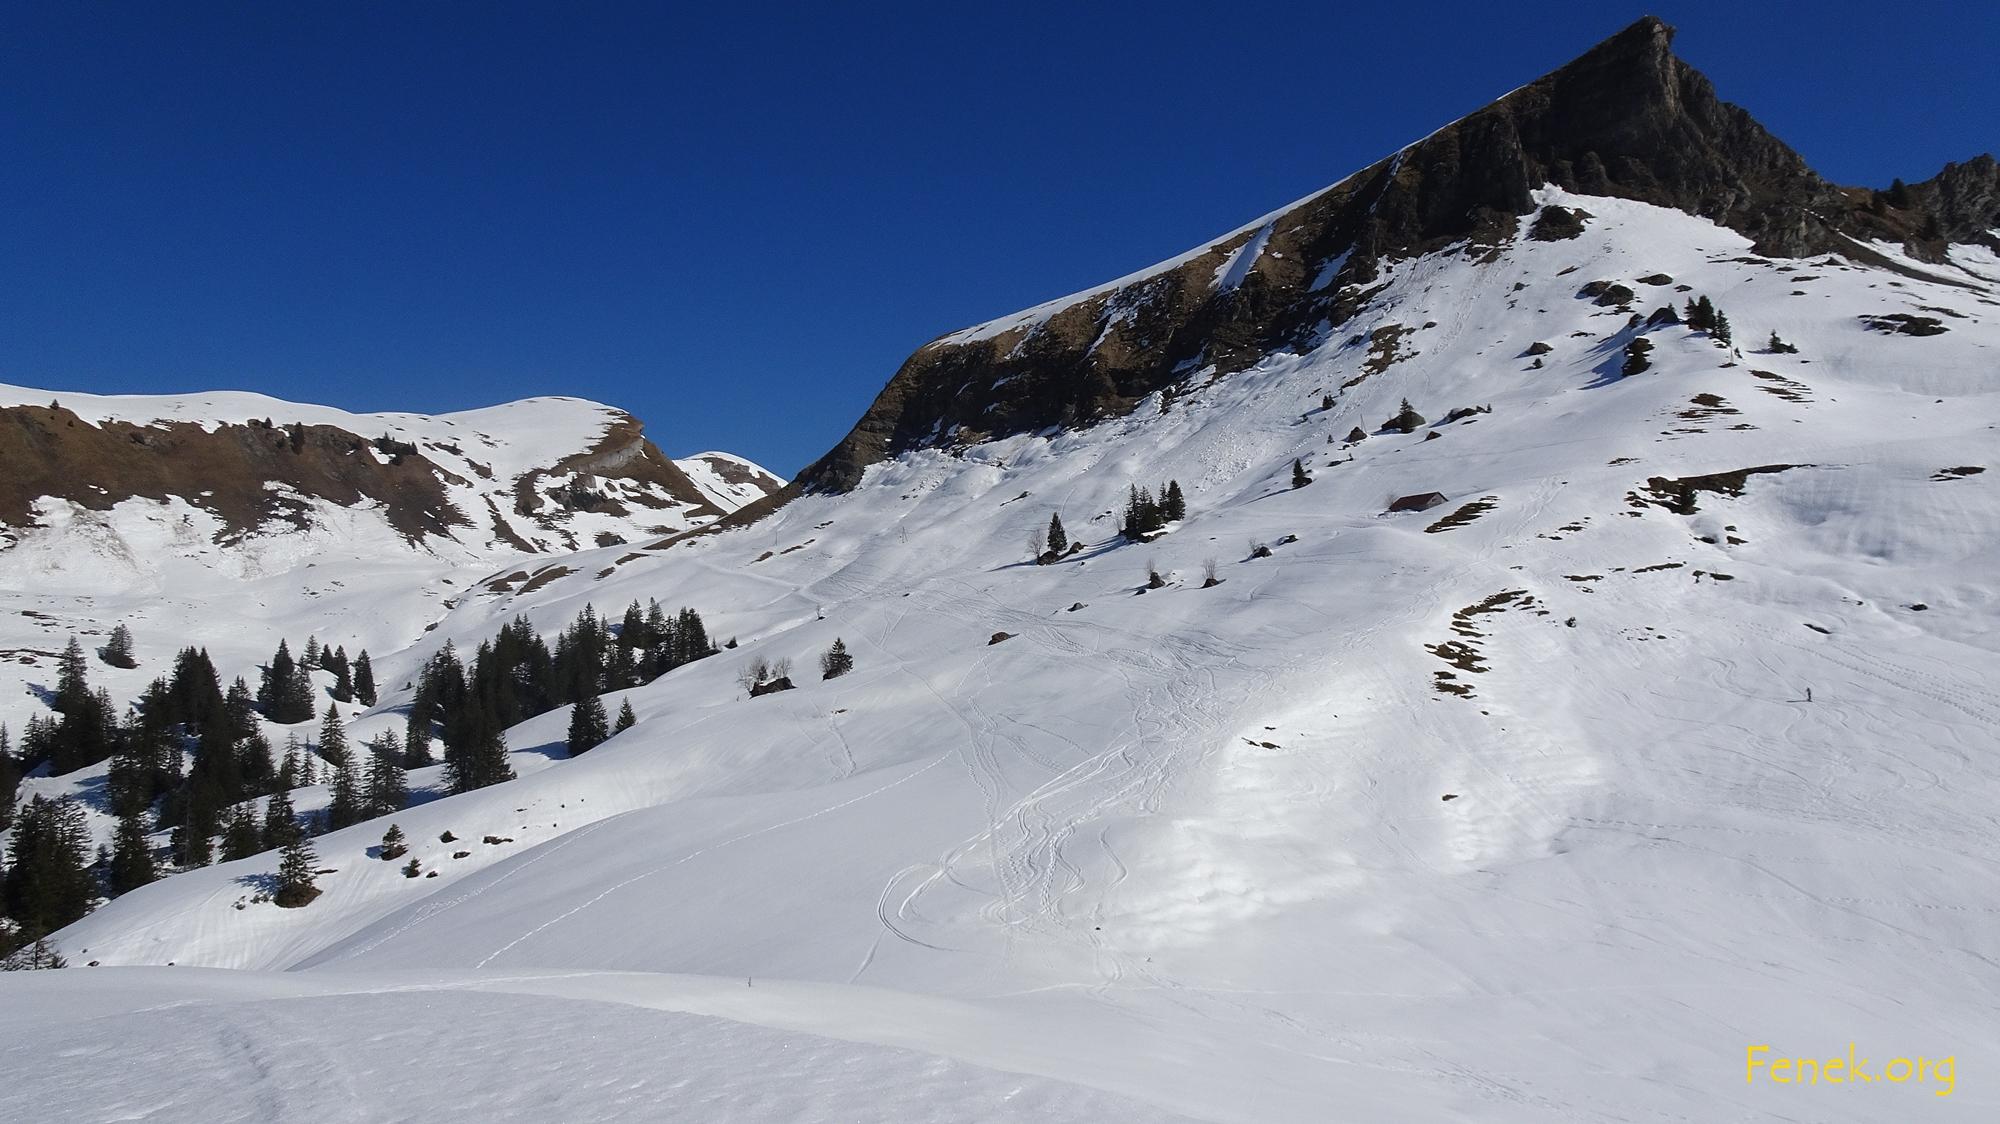 Unter dem Schülberg geht es dem Hang entlang zu den beiden Gipfeln in der Ferne